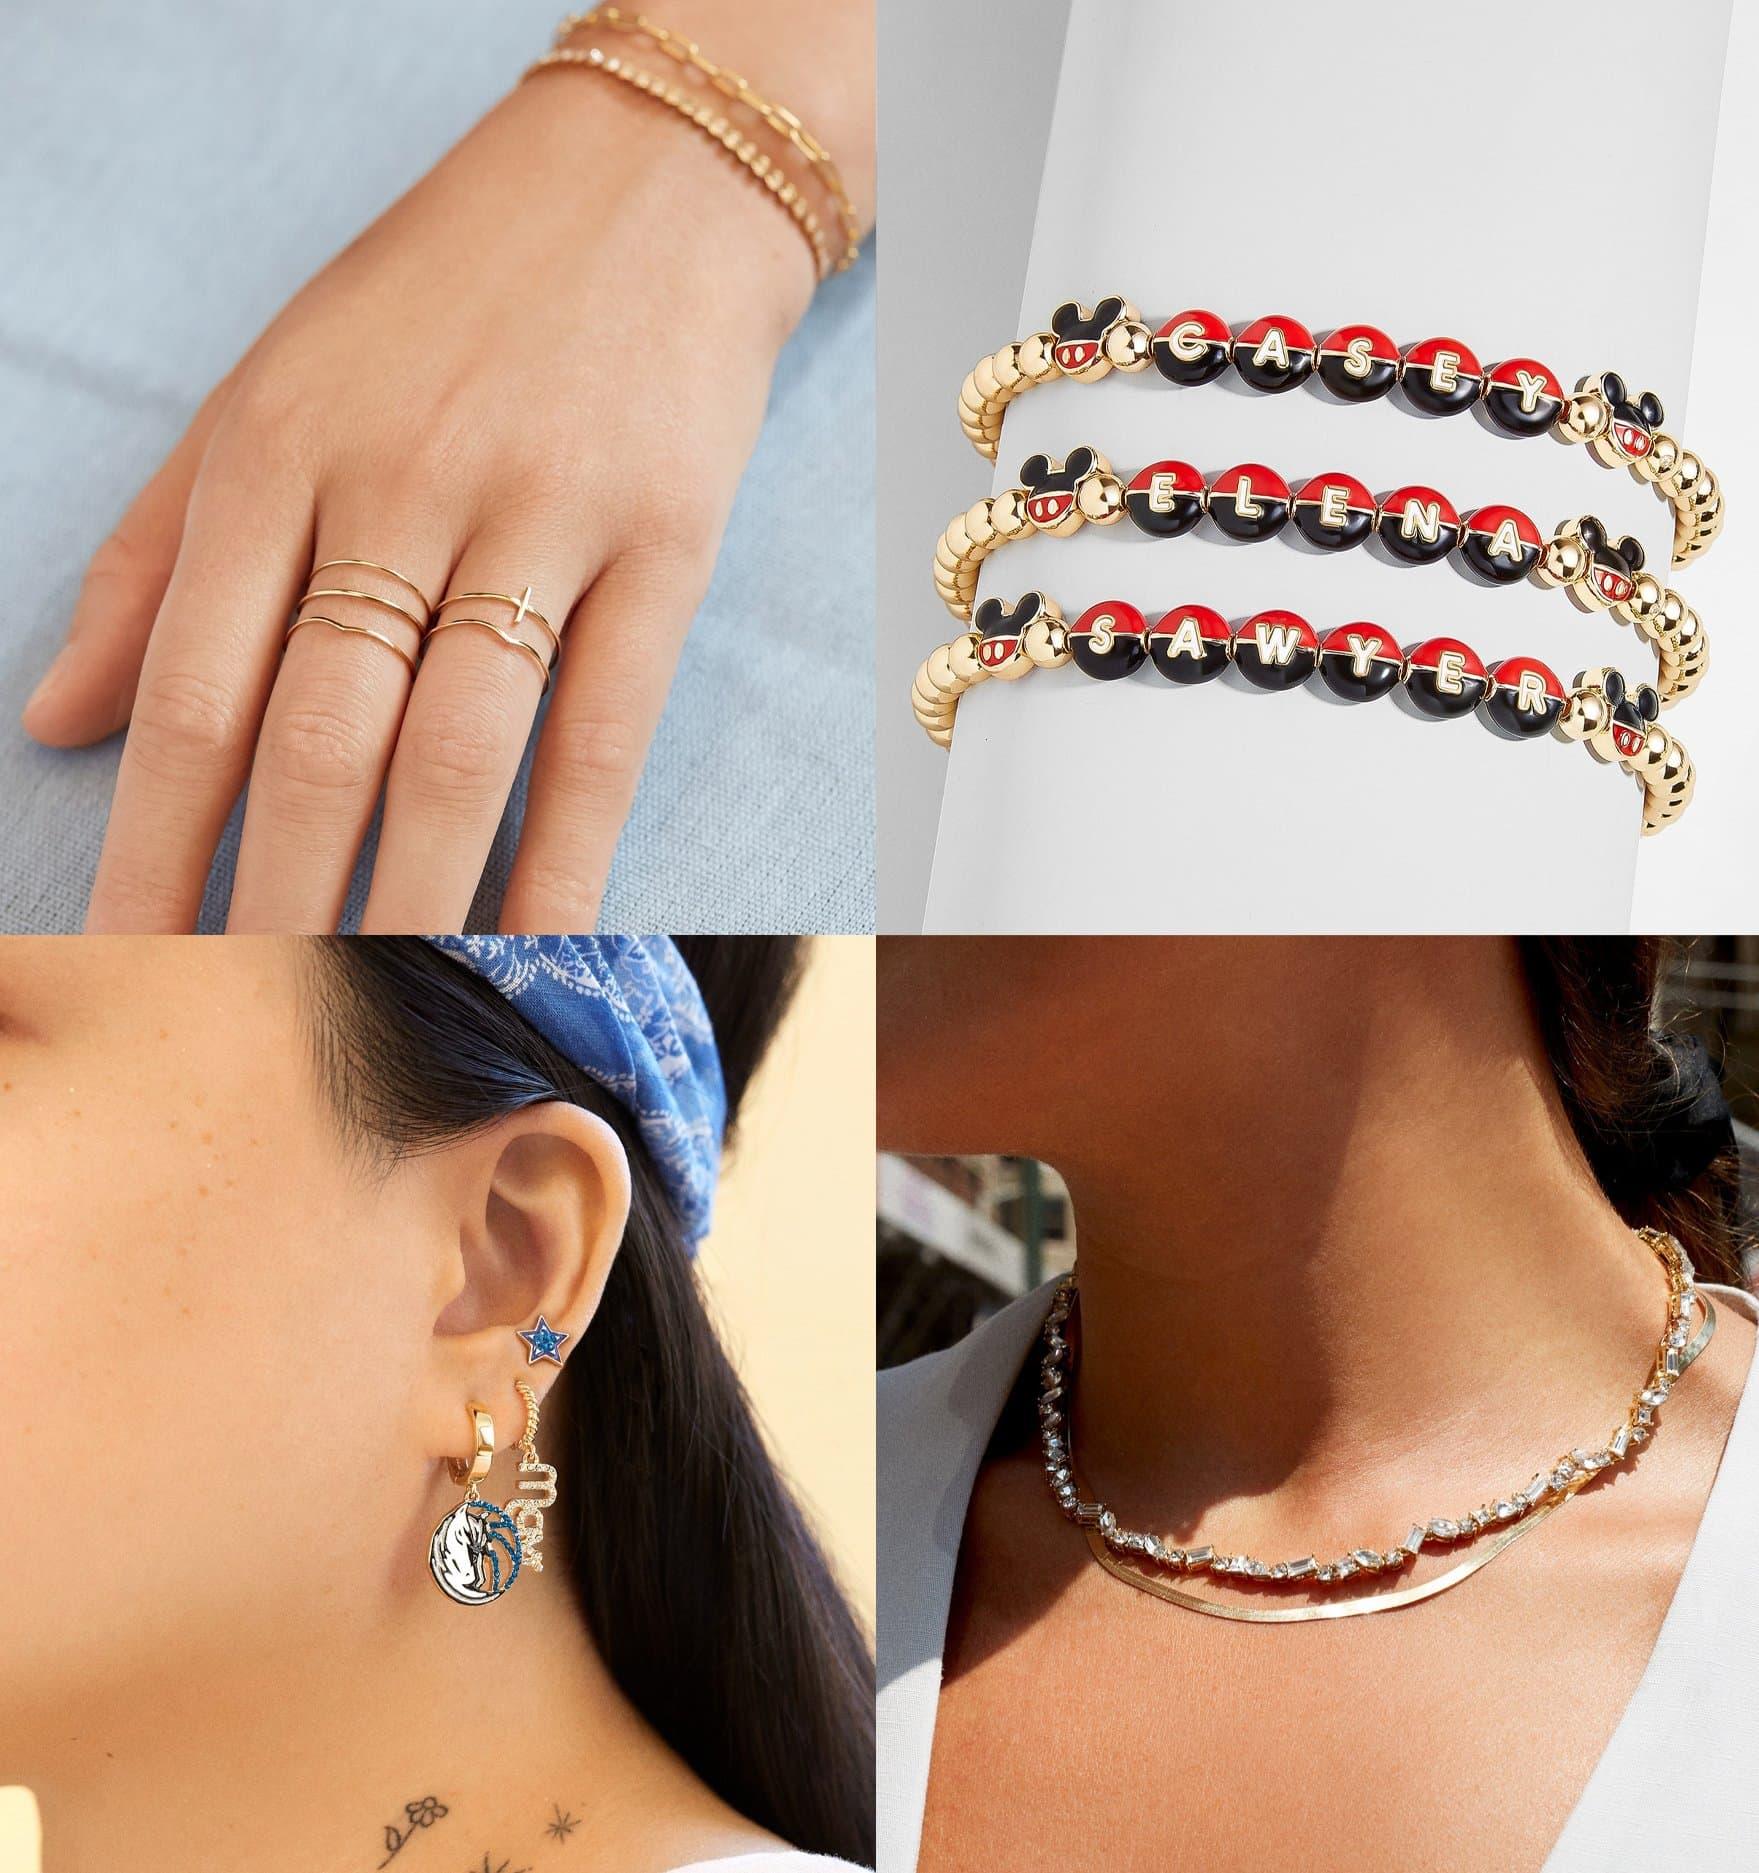 BaubleBar Quintet 18K Gold ring set, $62; BaubleBar Mickey Mouse Disney Custom Pisa bracelet, $40; Dallas Maverick earring set, $68; BaubleBar Femi Tennis necklace, $68